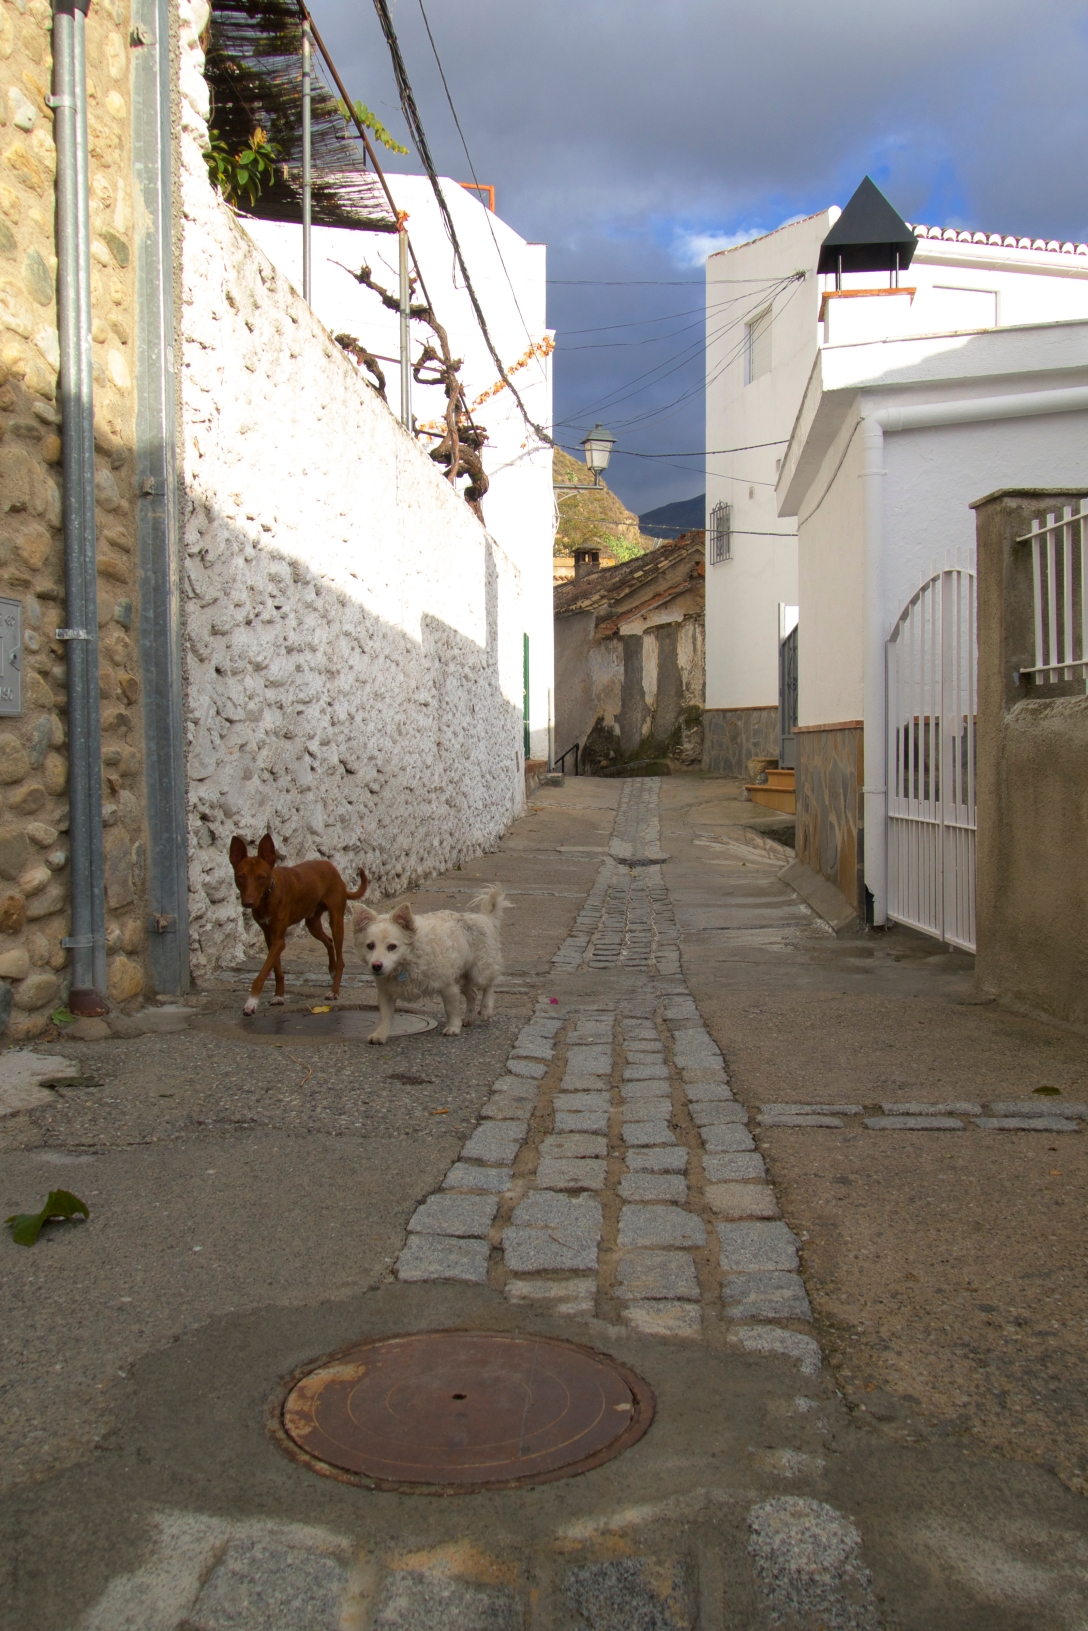 Dogs in Monachil